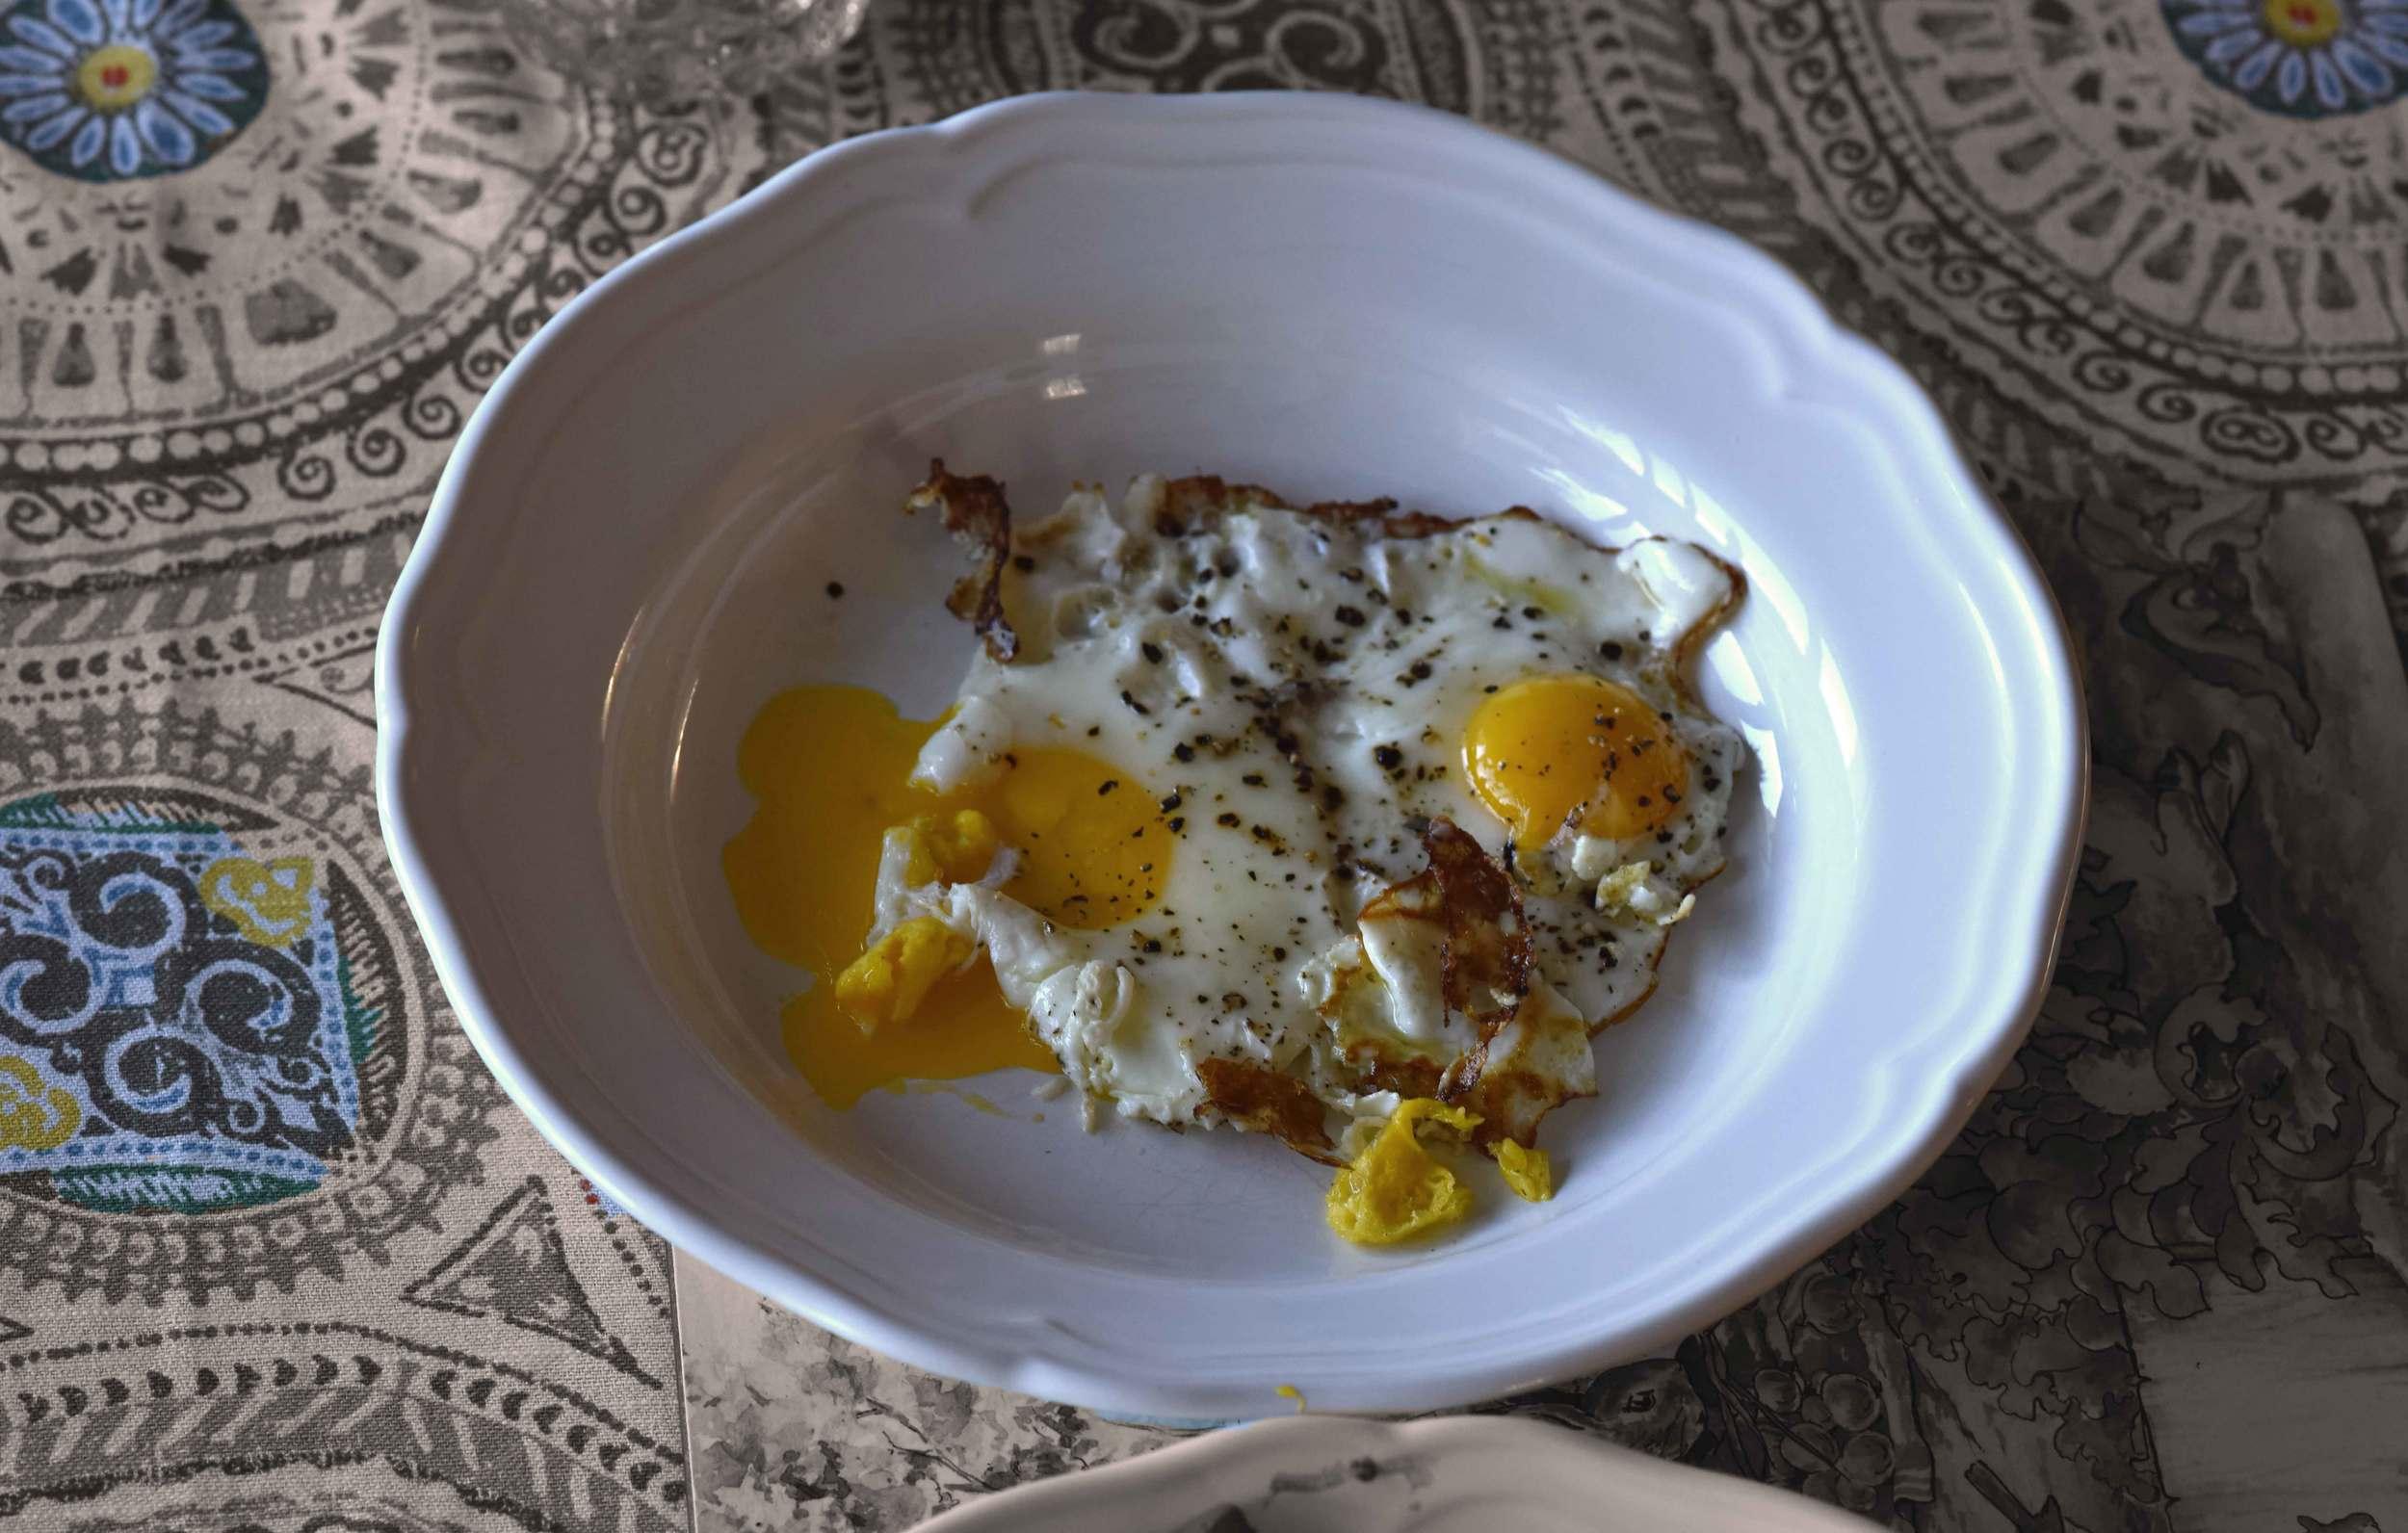 Eggs as a side-dish, image©gunjanvirk